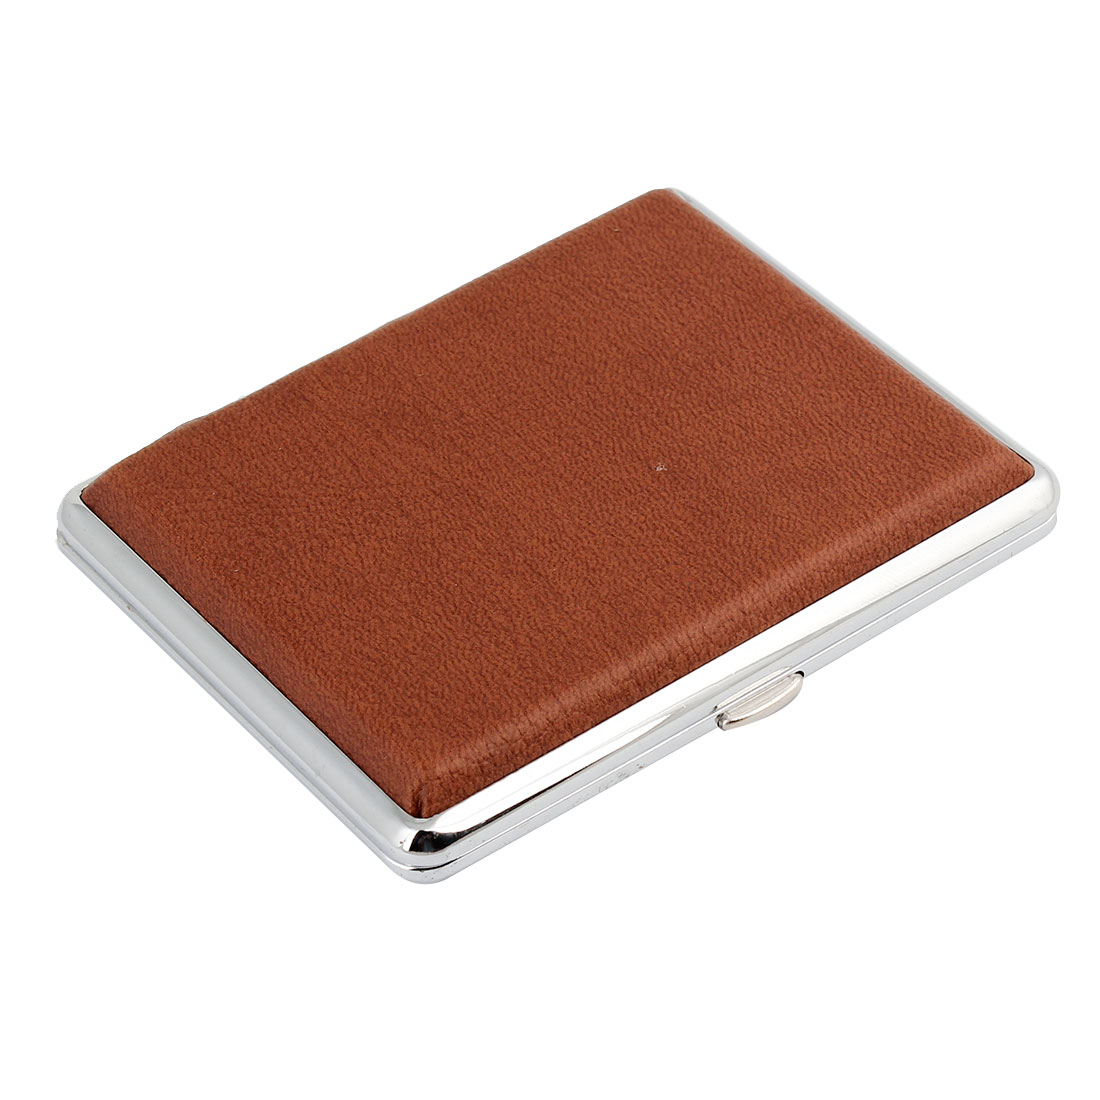 Faux Leather Choclate Color Square Shape Cigarette Cigar Case Box